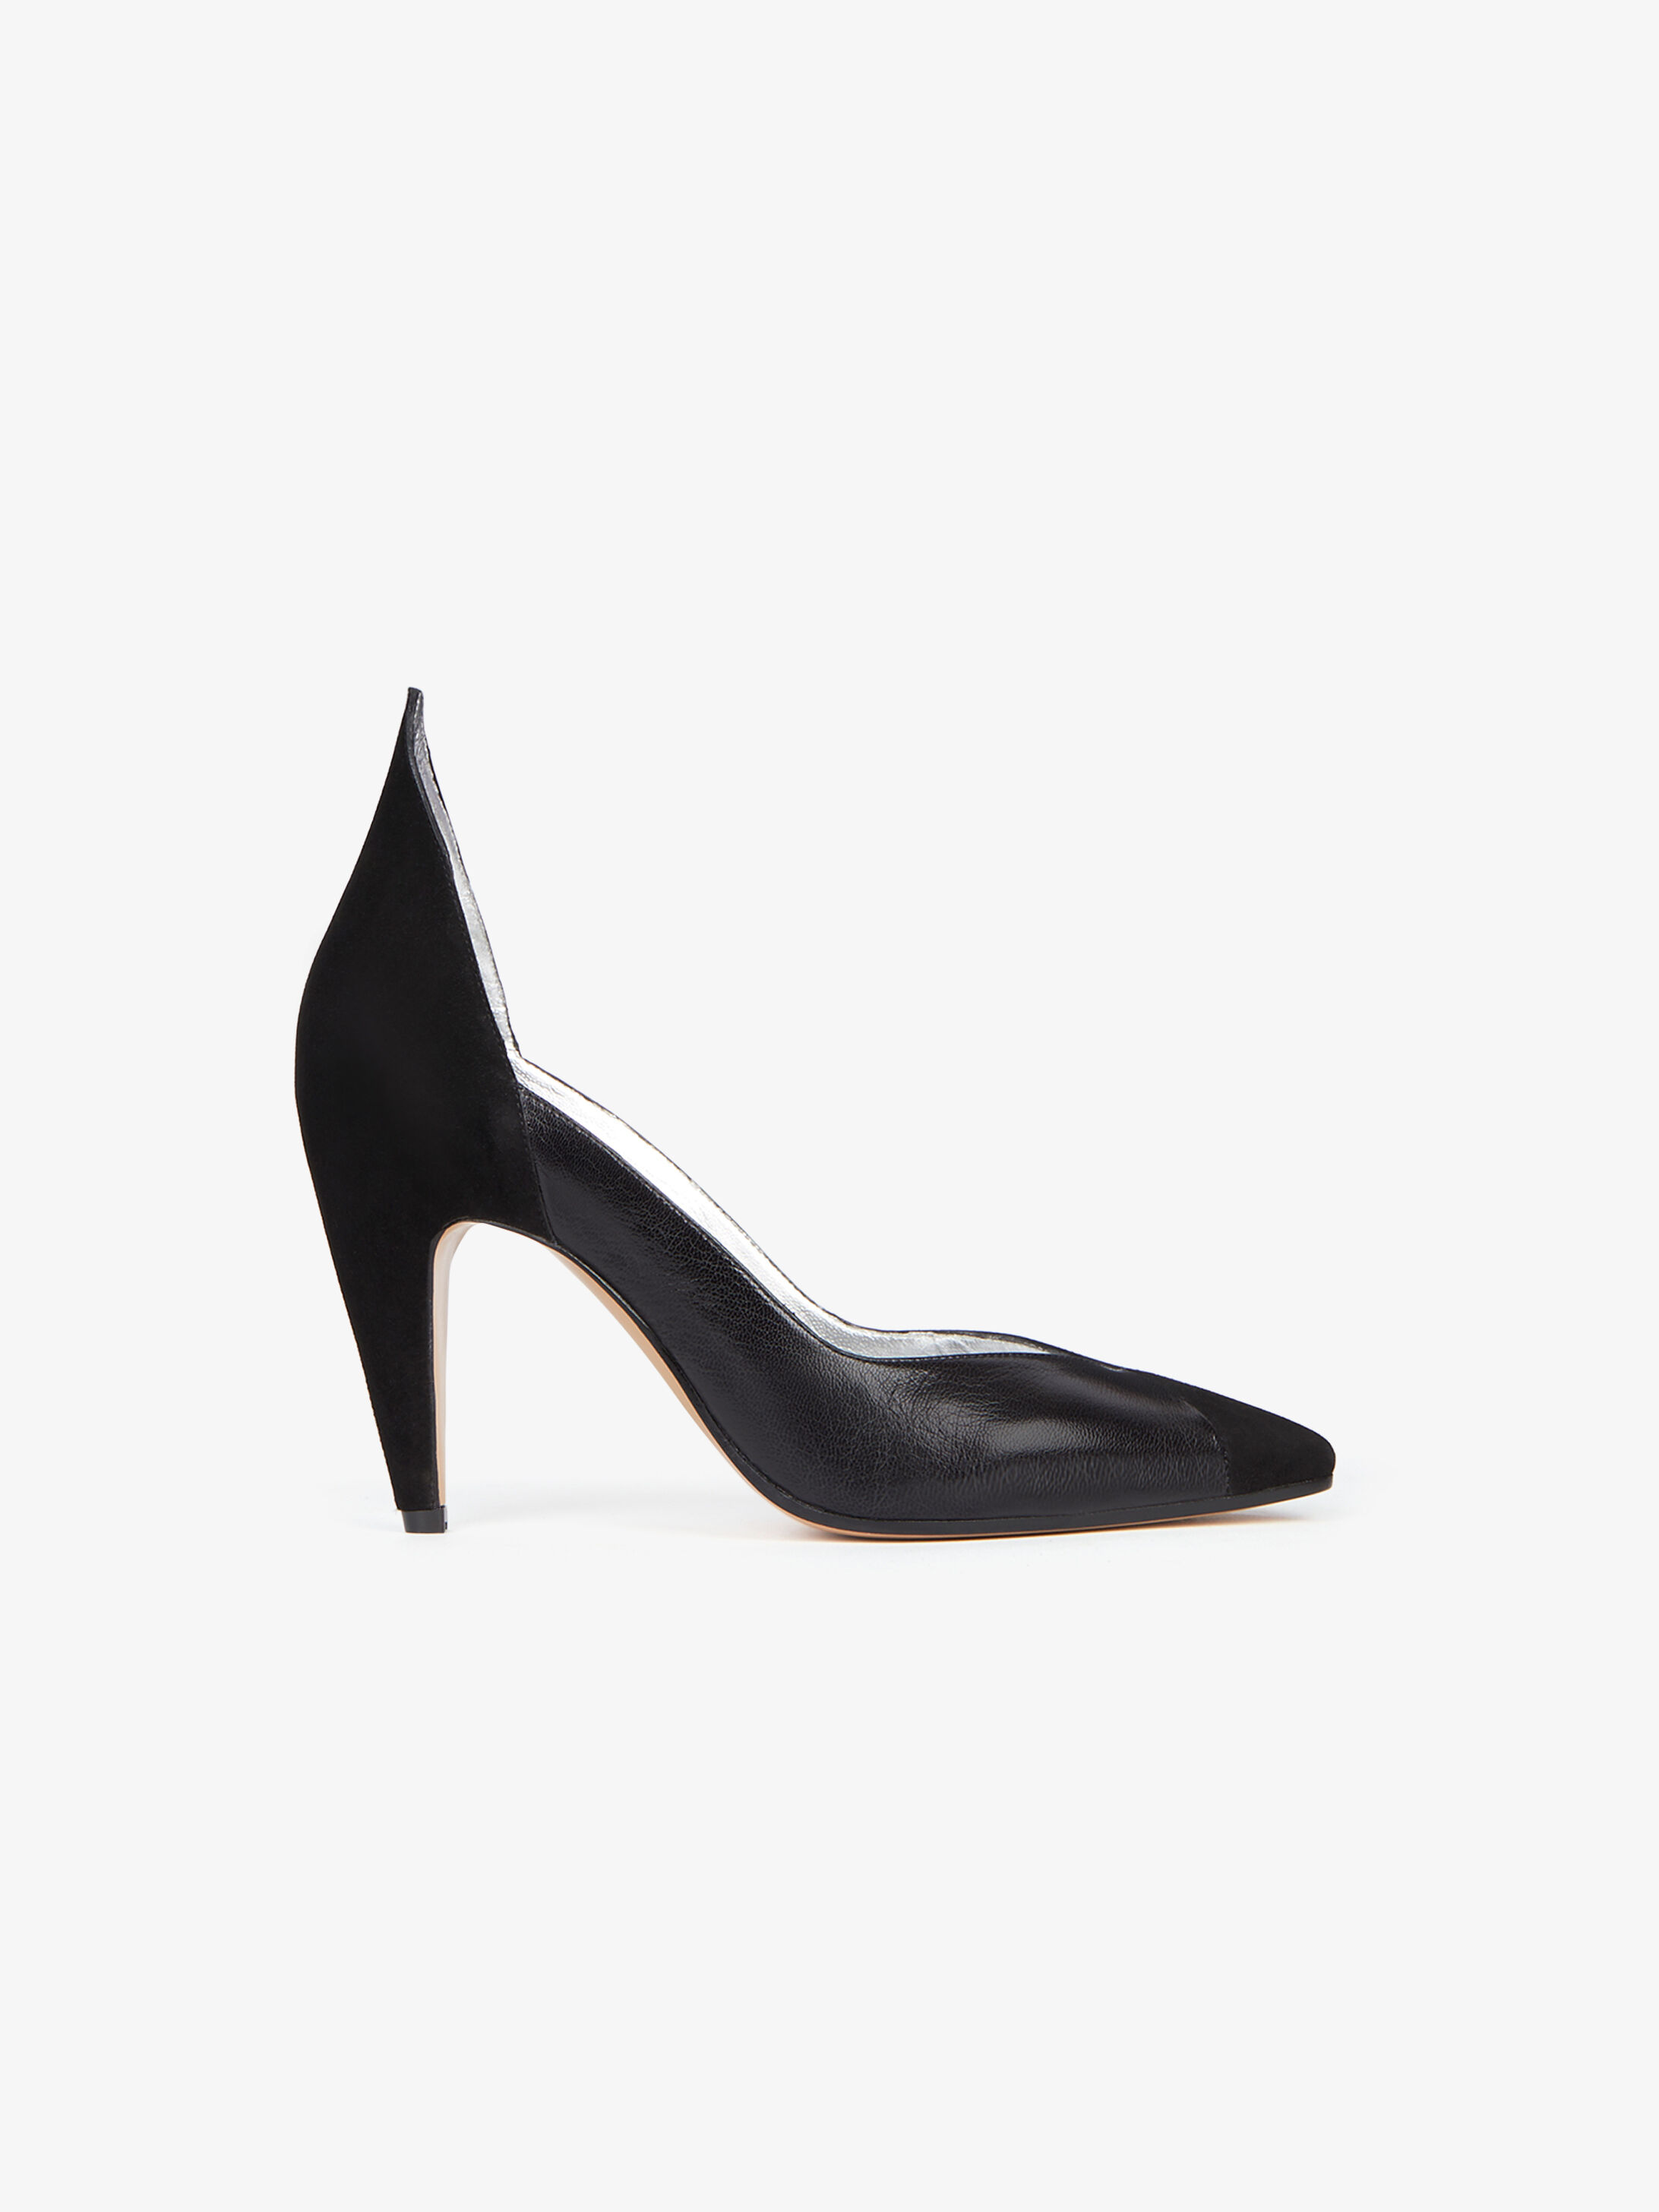 Women's And GivenchyGivenchy Paris Sandals By Collection Pumps F3TlK1cJ